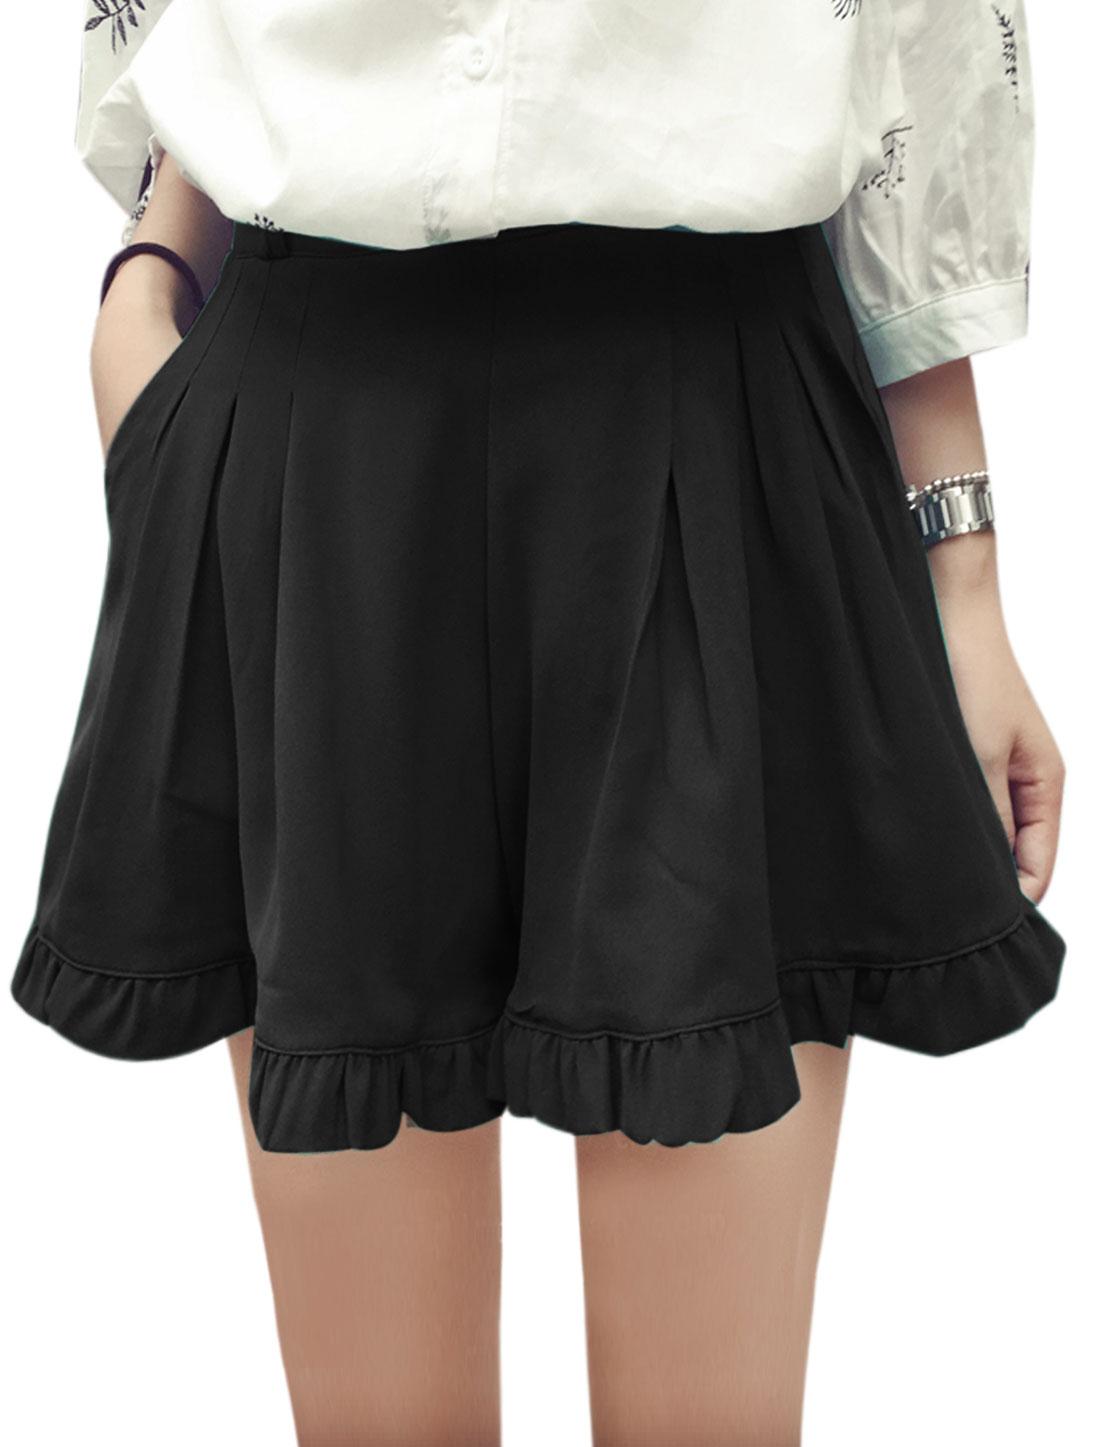 Women Mid Rise Belt Loop Front Pockets Hidden Zipper Side Casual Shorts Black S